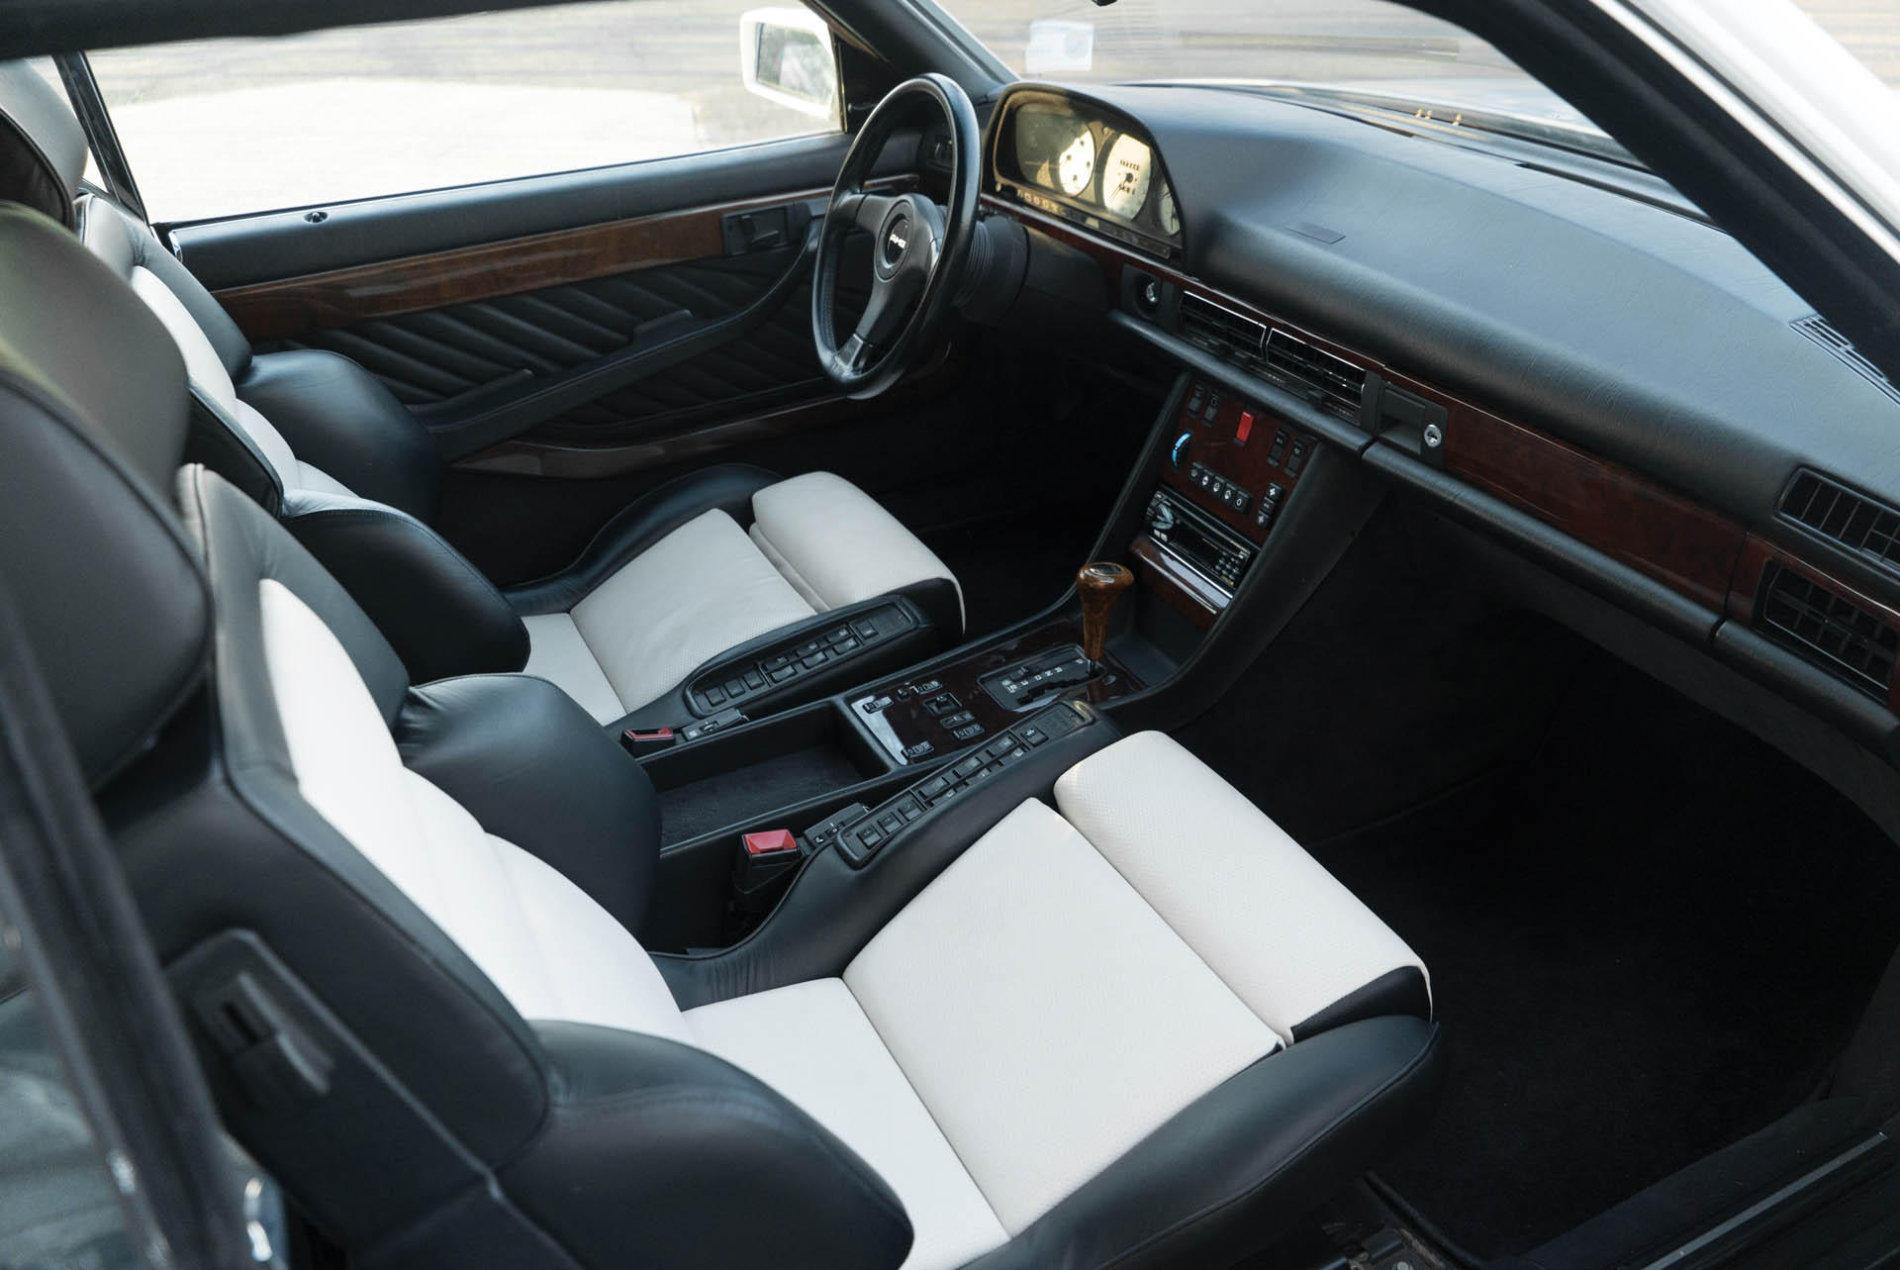 Mercedes-Benz 560 SEC 6.0 AMG - Mercedes-Benz 560 SEC 6.0 AMG